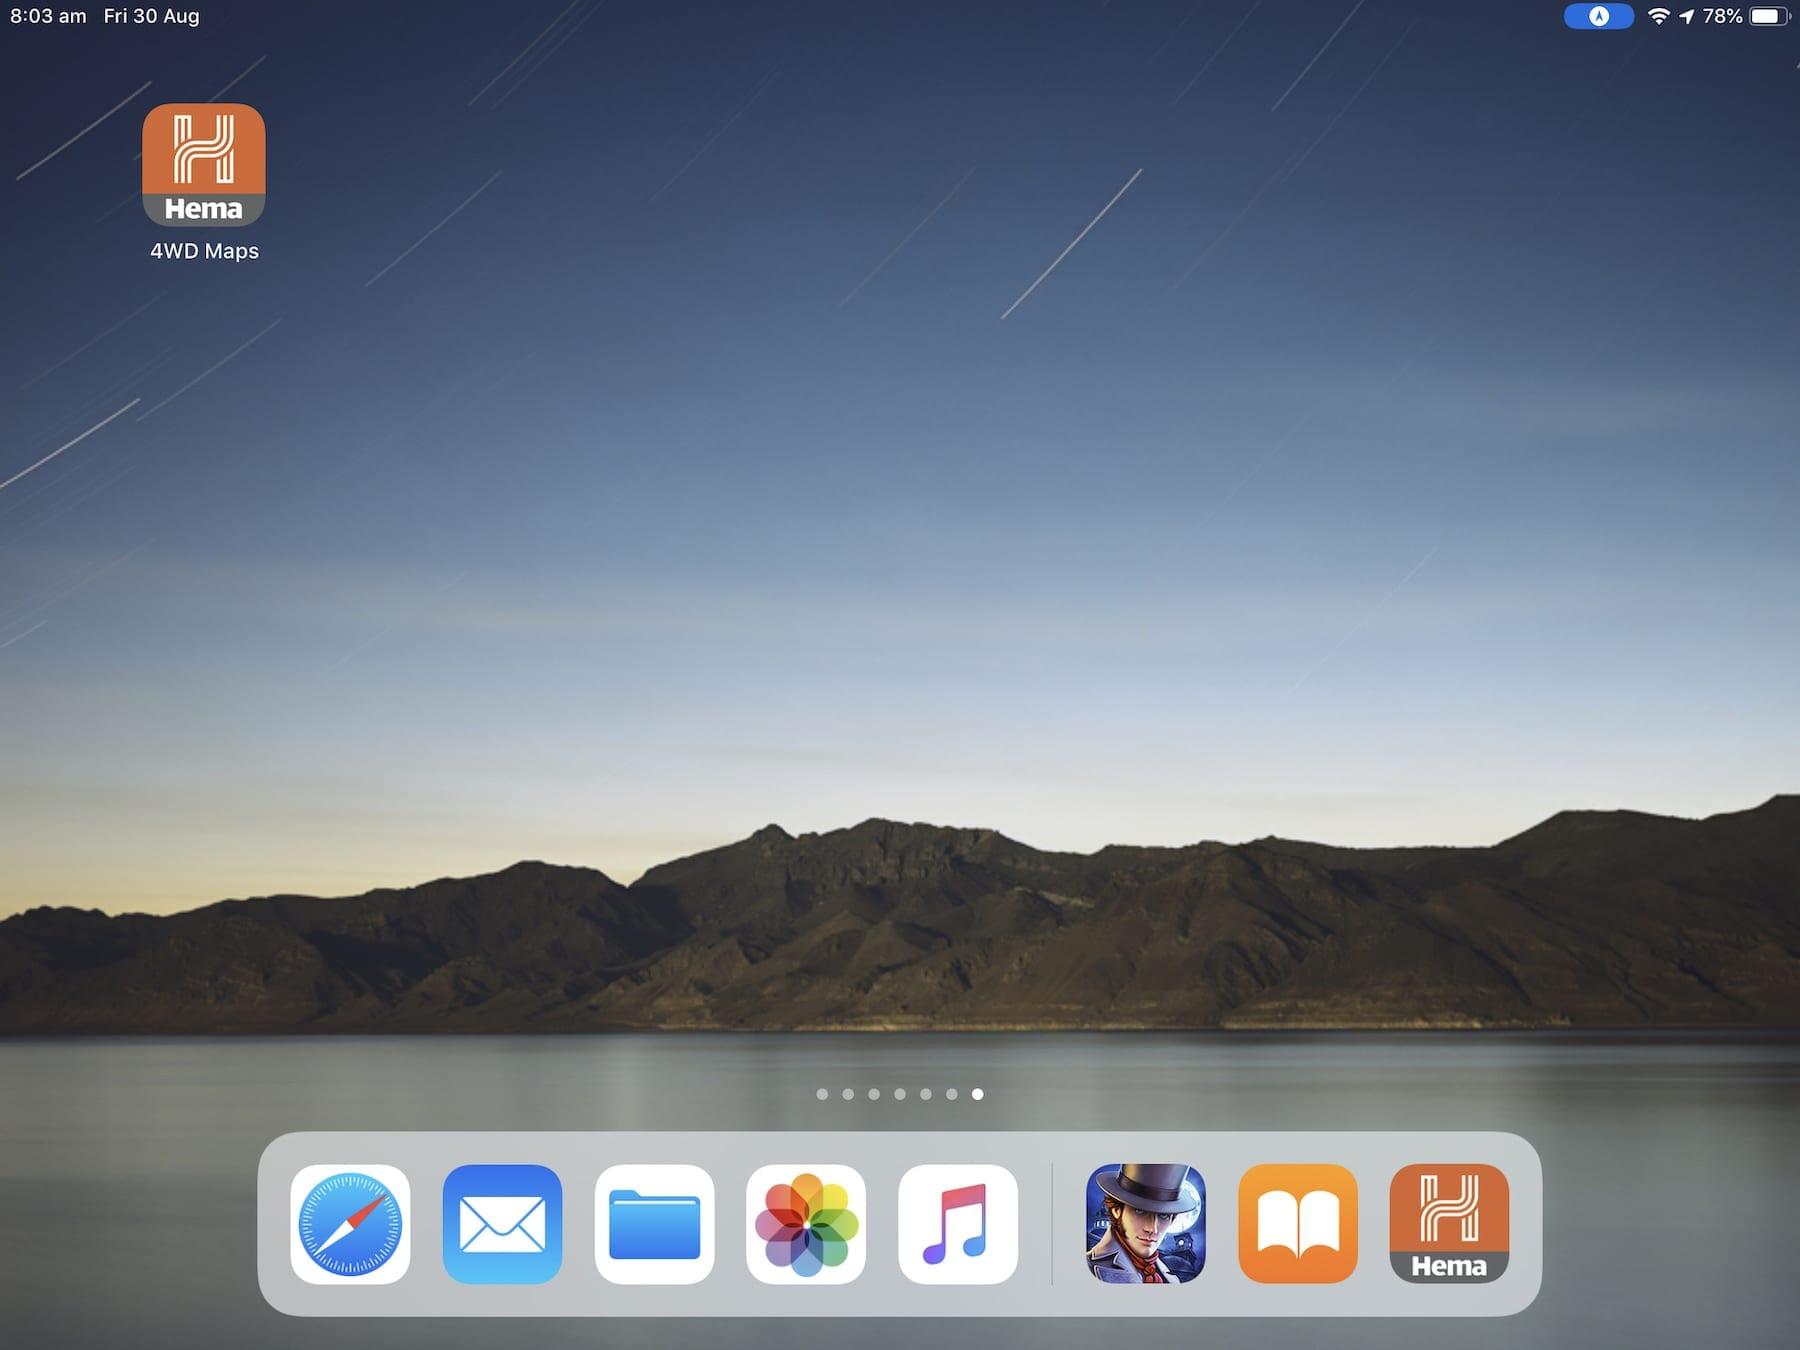 The Hema 4WD Maps app on an iPad.